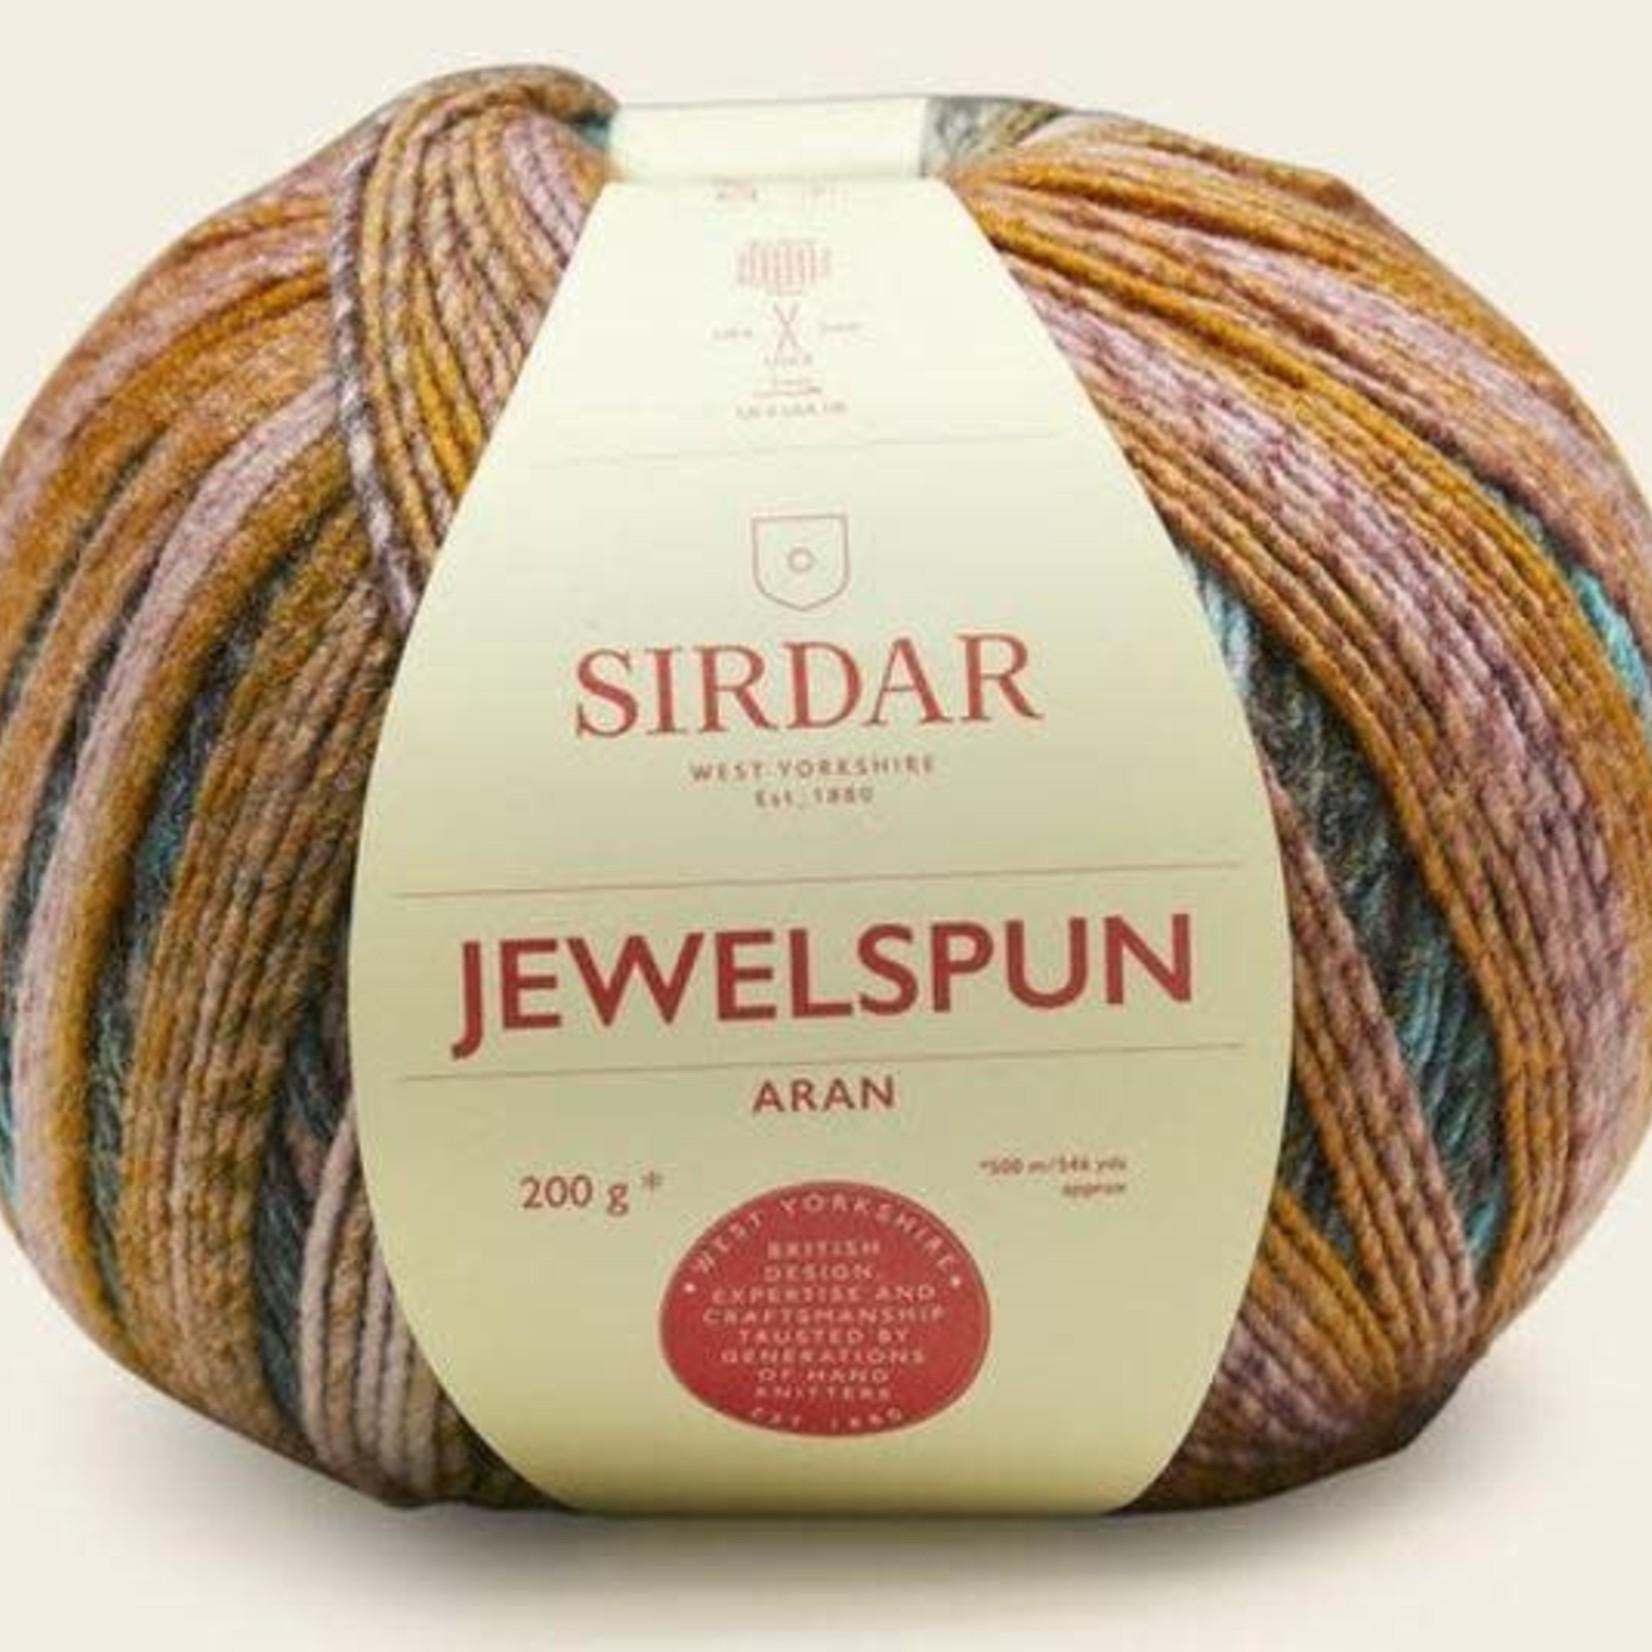 Sirdar Jewelspun (200g) by Sirdar